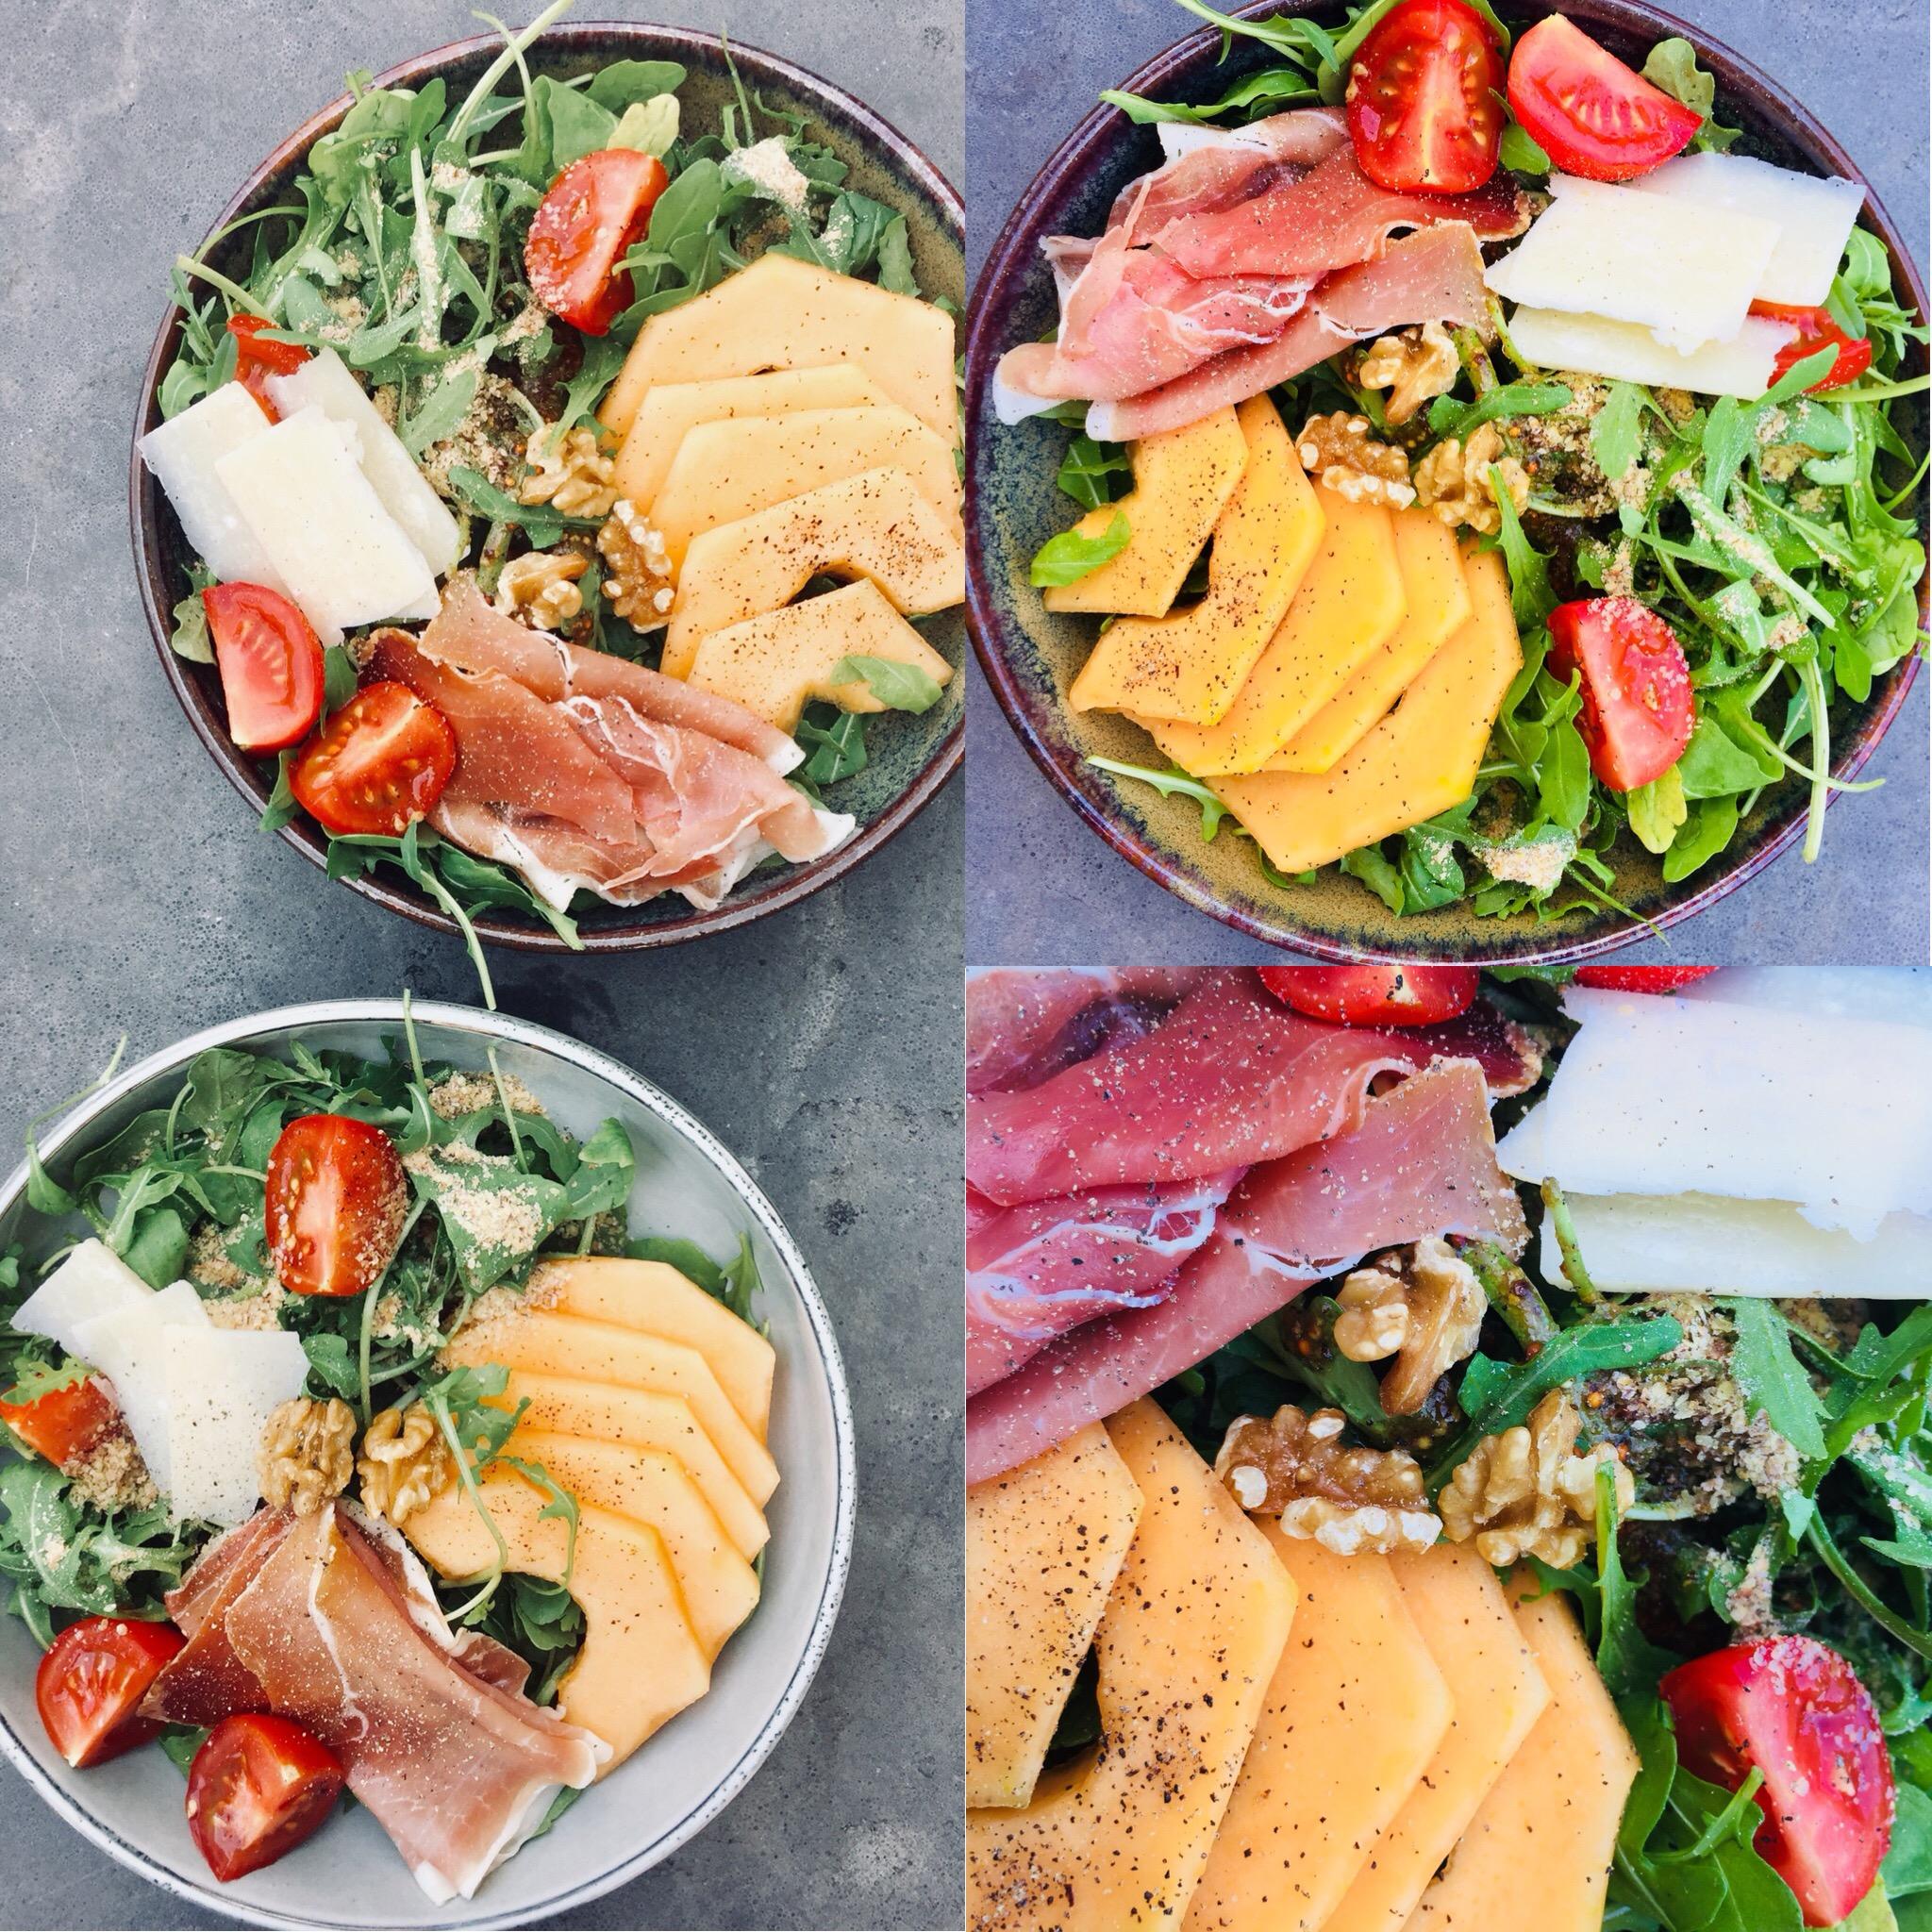 Salade jambon cru, melon